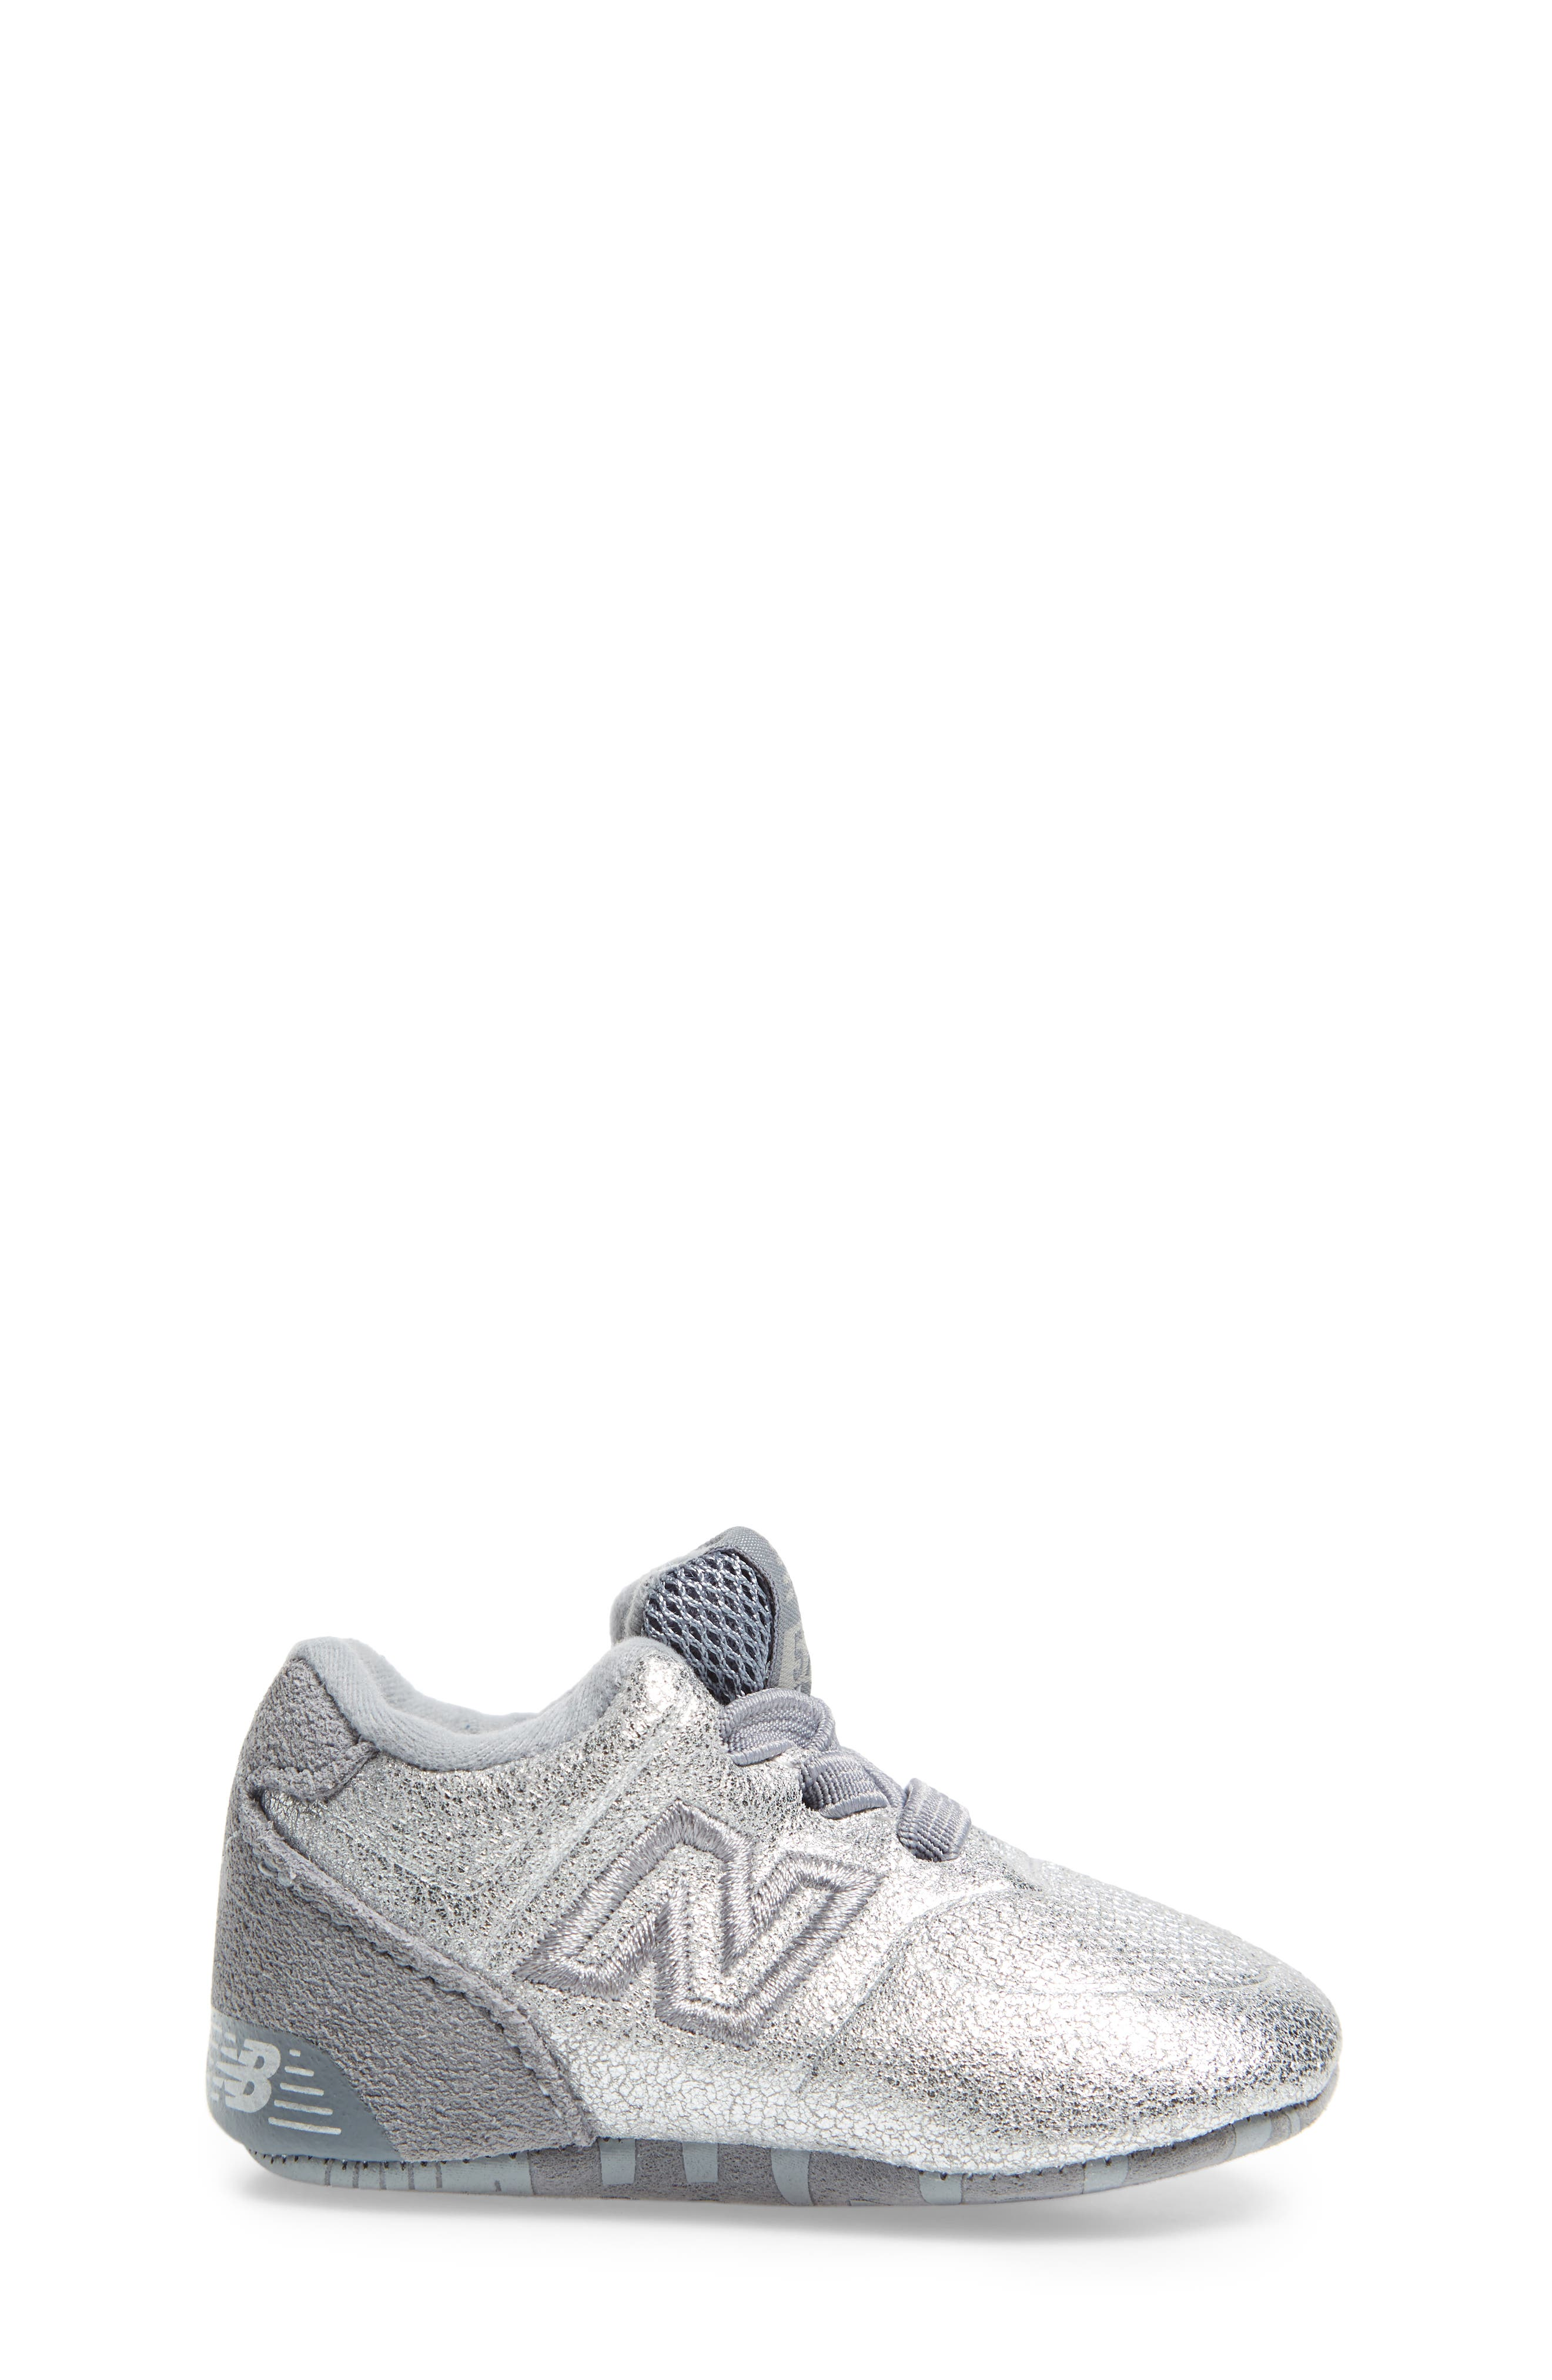 574 Metallic Crib Sneaker,                             Alternate thumbnail 3, color,                             040